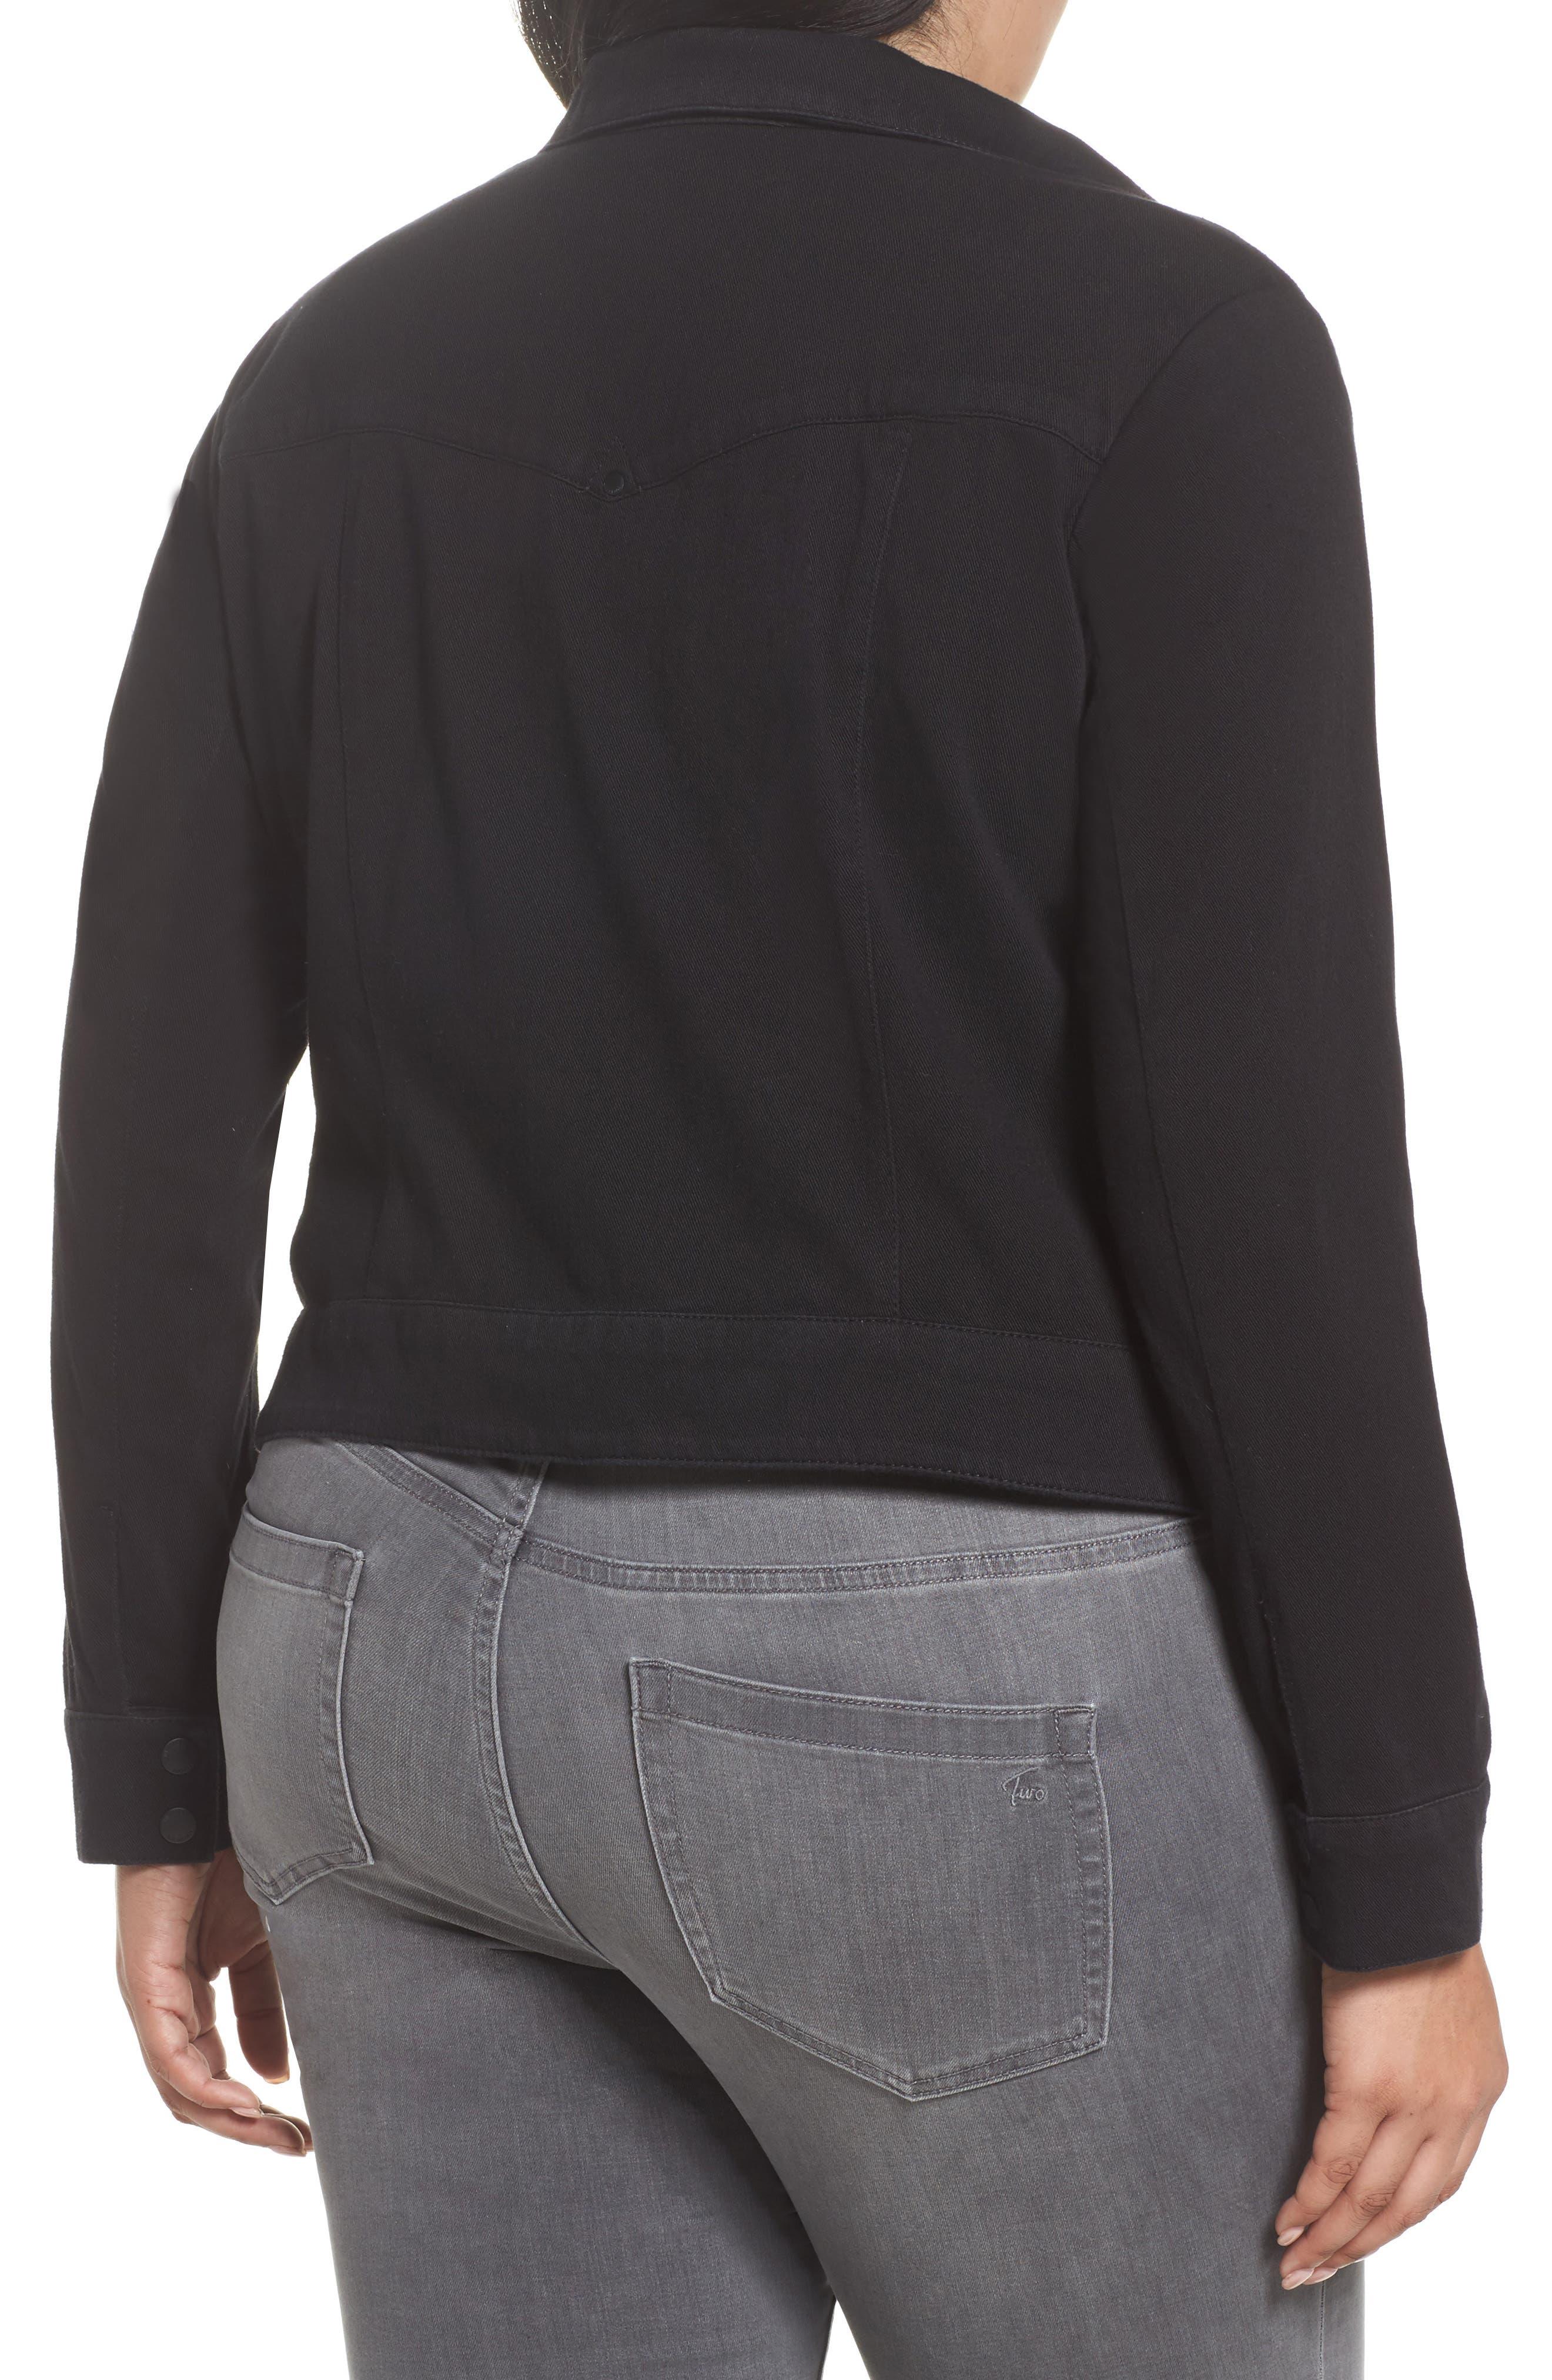 Alternate Image 2  - Liverpool Jeans Company Zip Knit Moto Jacket (Plus Size)